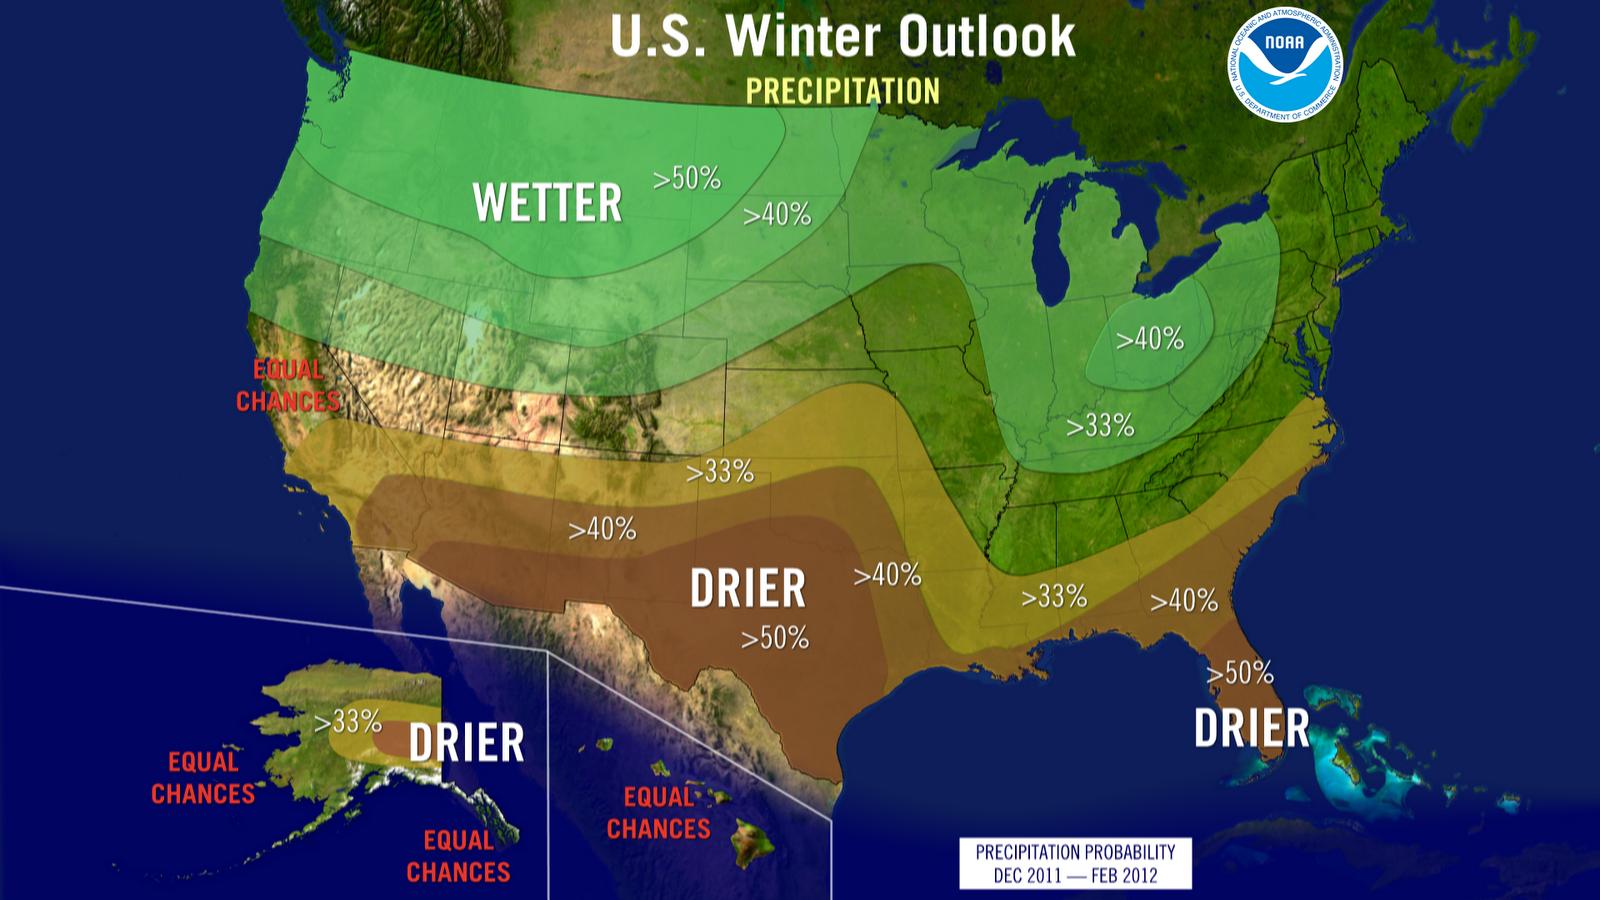 NWS NOAA Winter Precipitation Outlook.